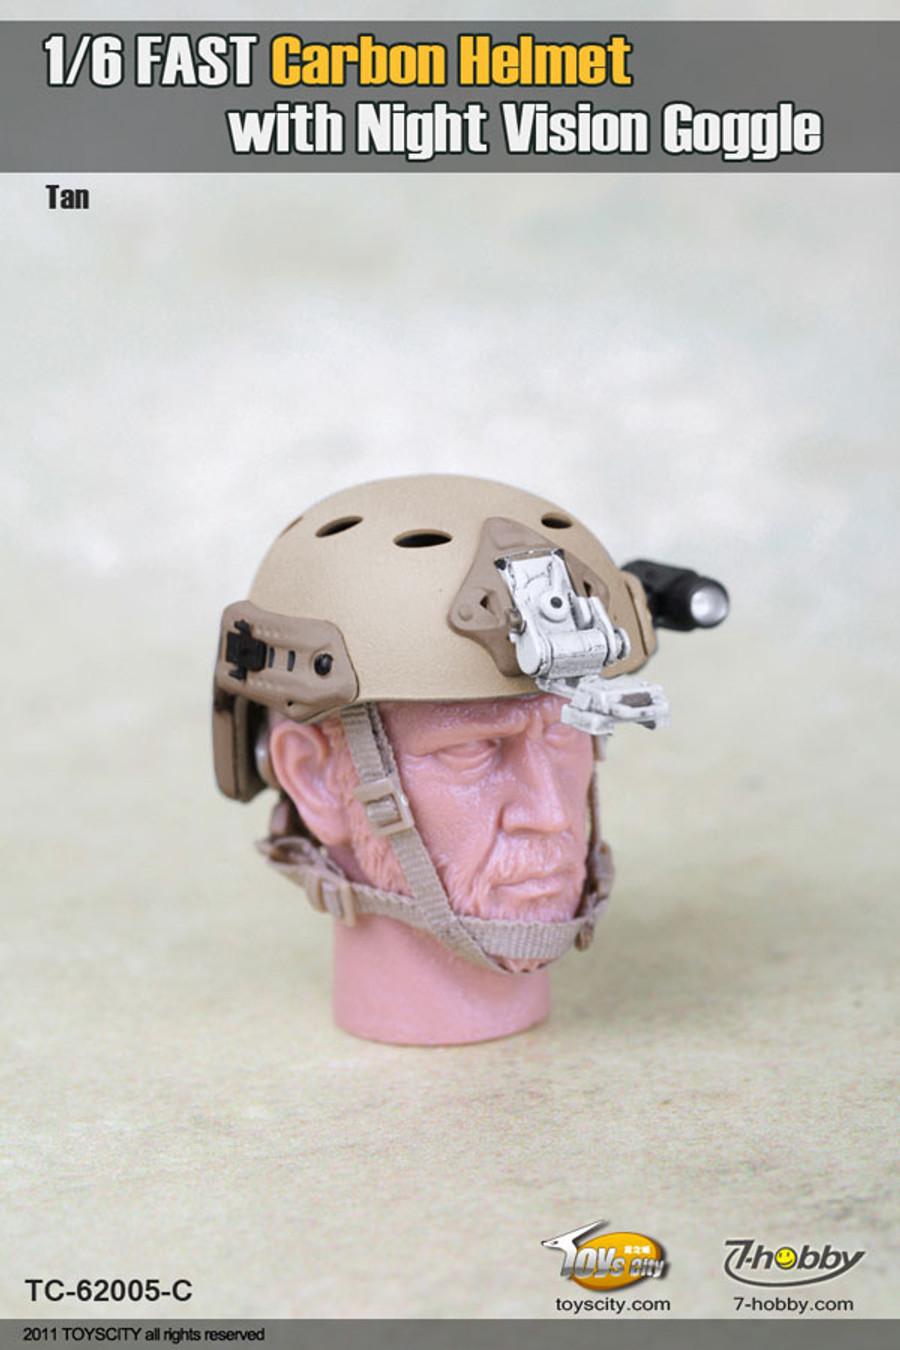 Toys City - Fast Carbon Helmet - Tan